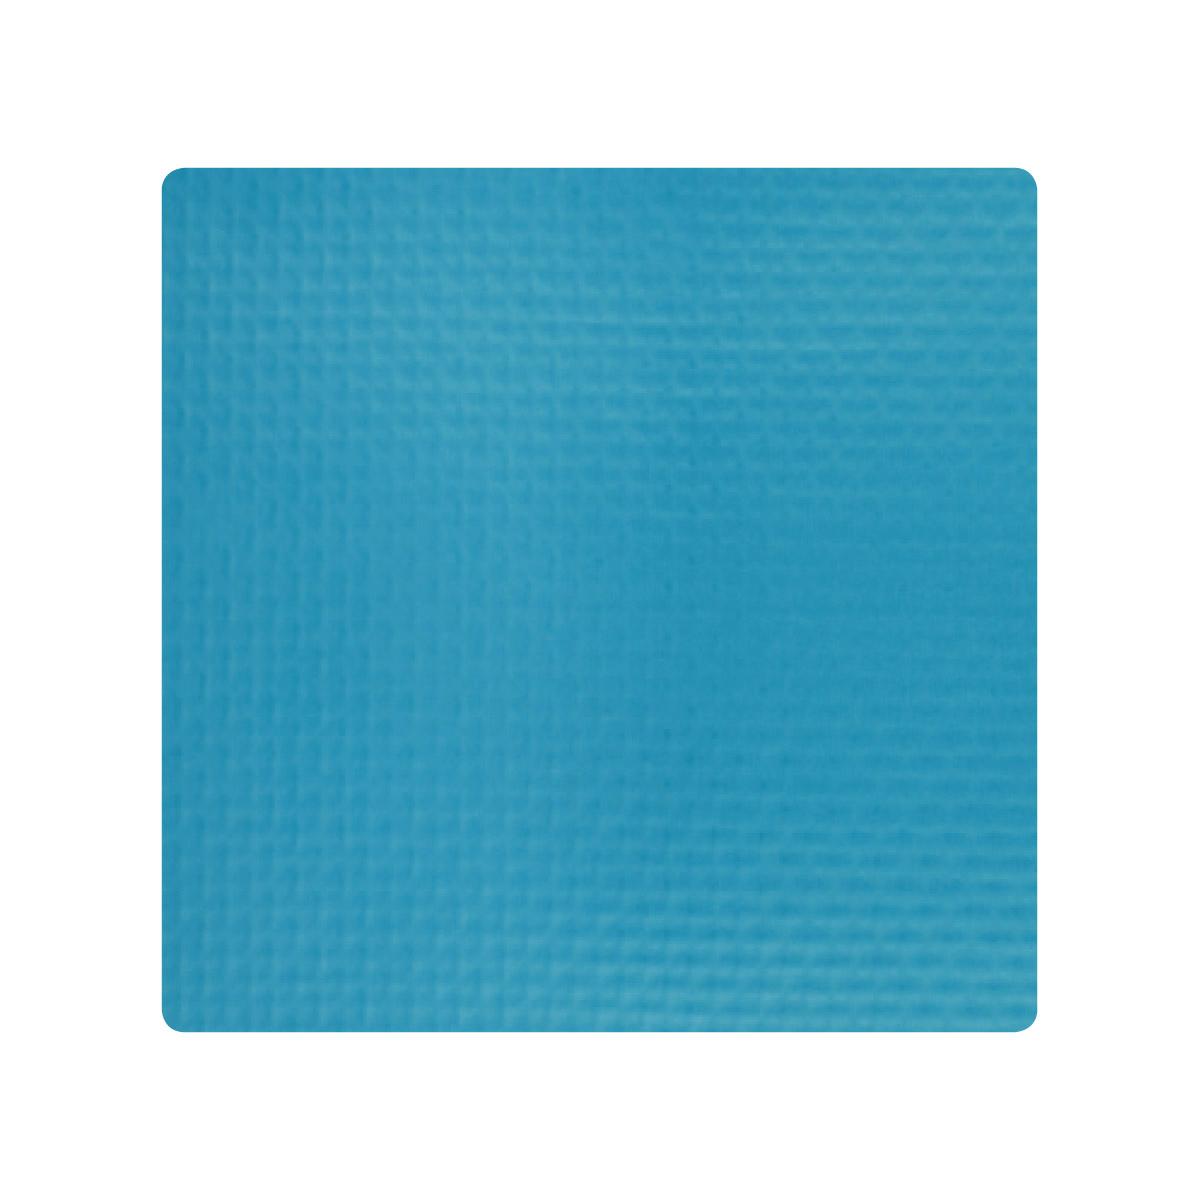 Schwimmbadfolie deluxe dunkelblau, 165 cm Schwimmbadfolie deluxe dunkelblau, 165 cm